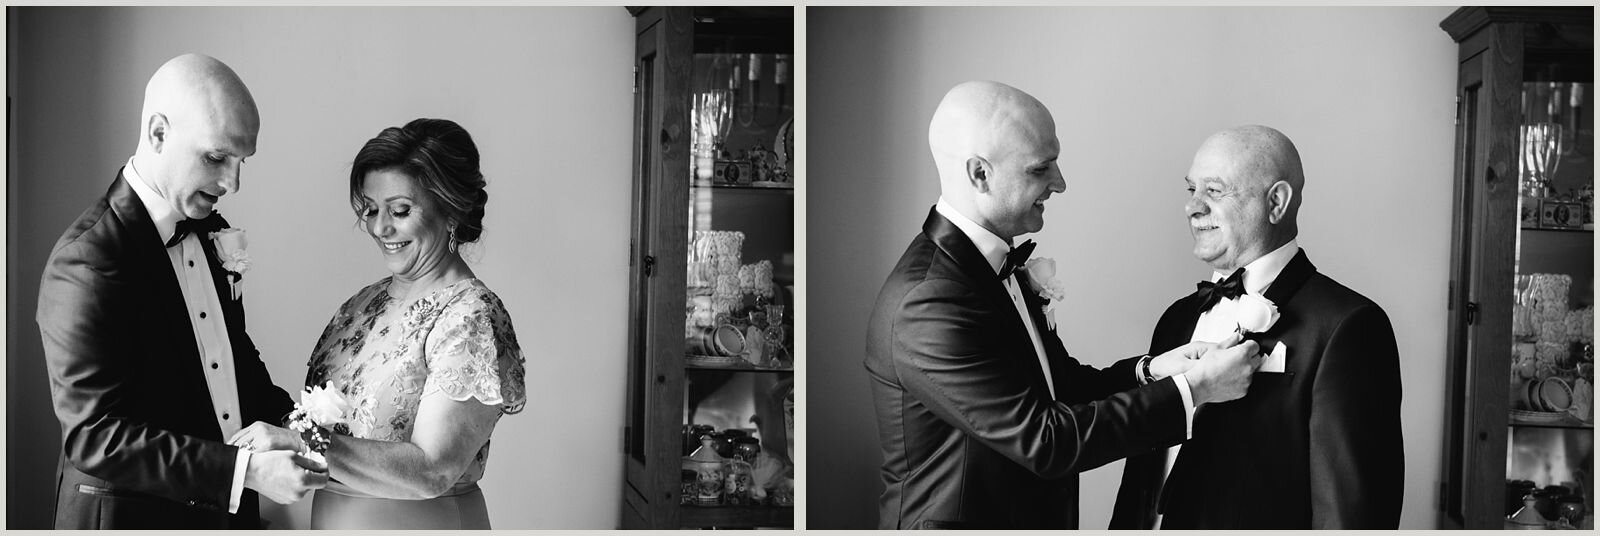 joseph_koprek_wedding_melbourne_the_prince_deck_0005.jpg